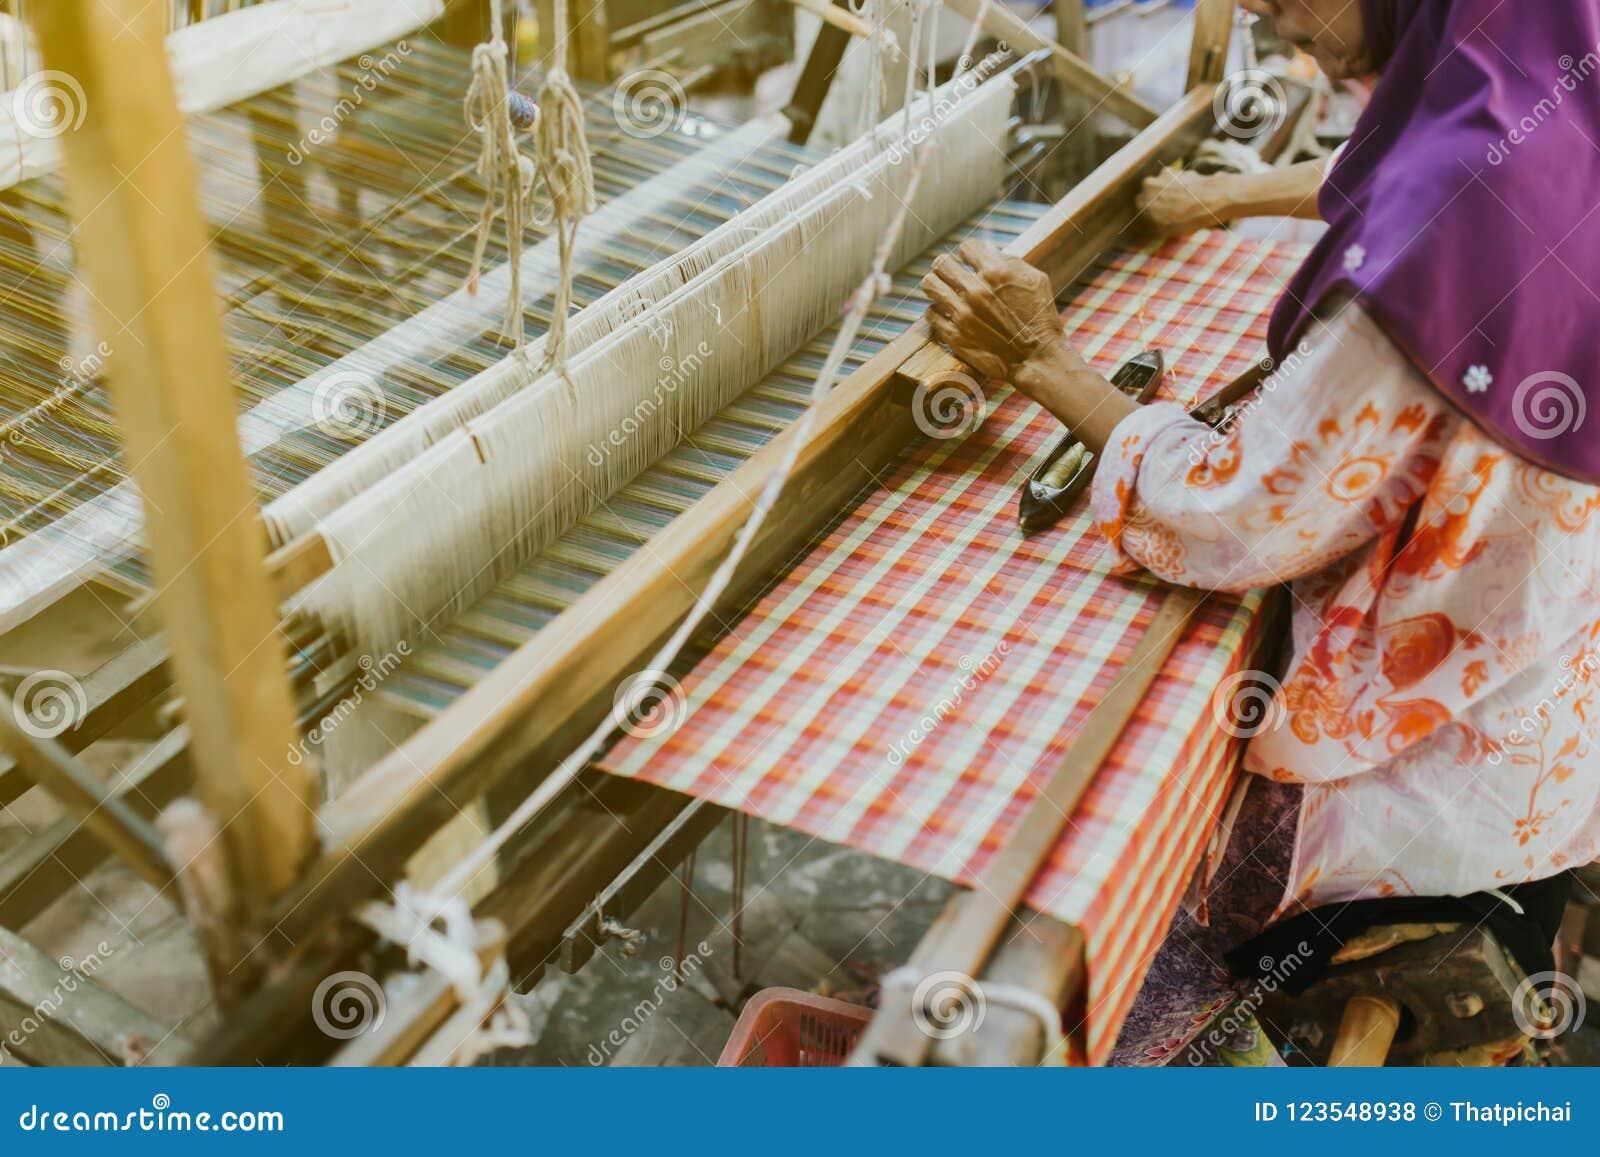 Weaving Machine - Use For Weaving Traditional Thai Silk